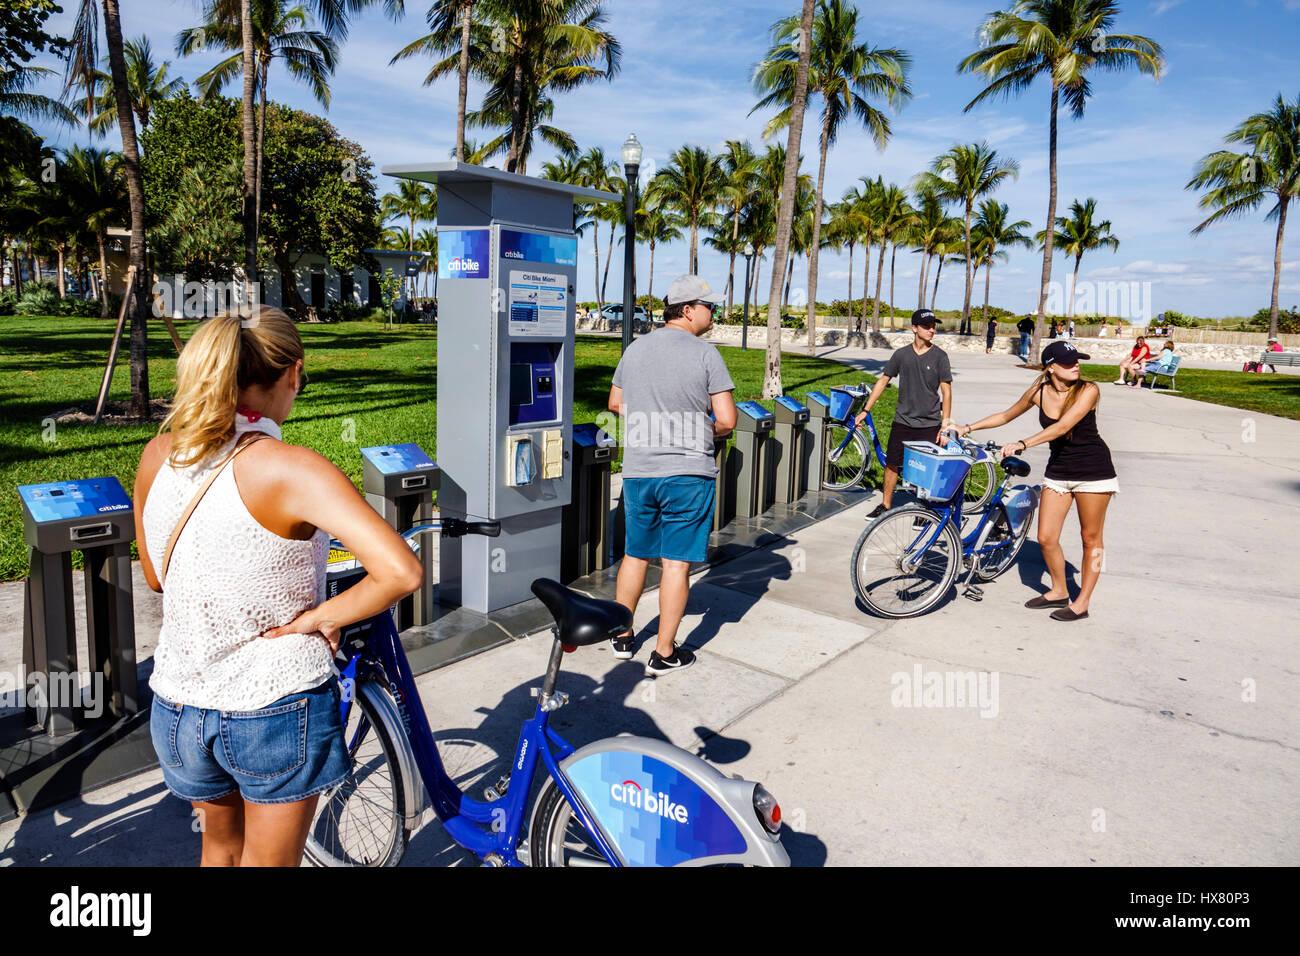 Citi Bike Miami >> Miami Beach Florida Lummus Park Citi Bike Bicycle Sharing